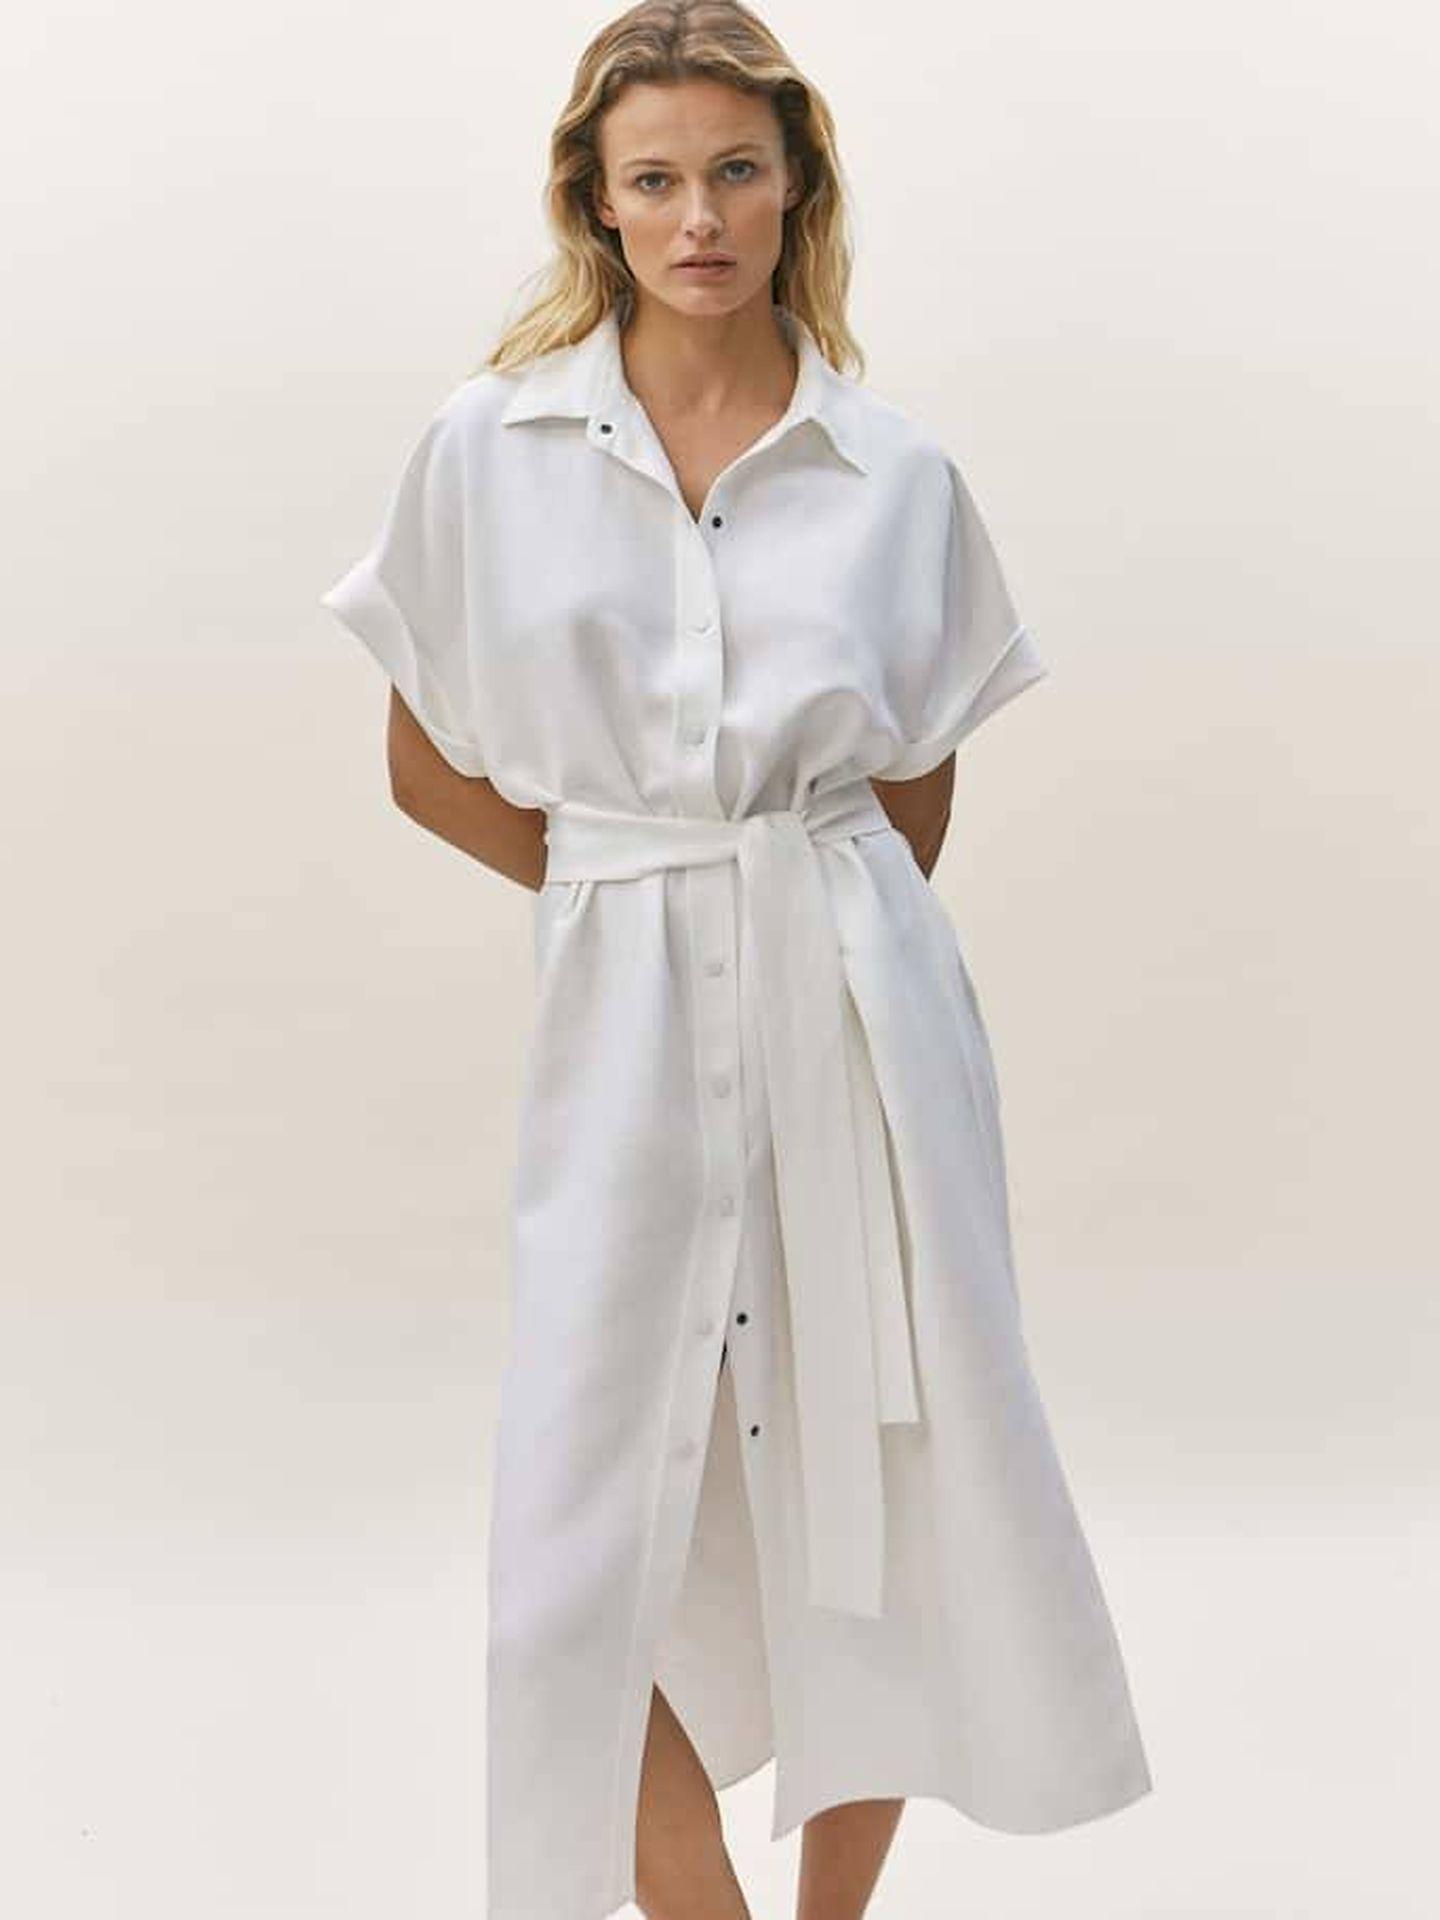 Vestido camillero blanco de Massimo Dutti. (Cortesía)